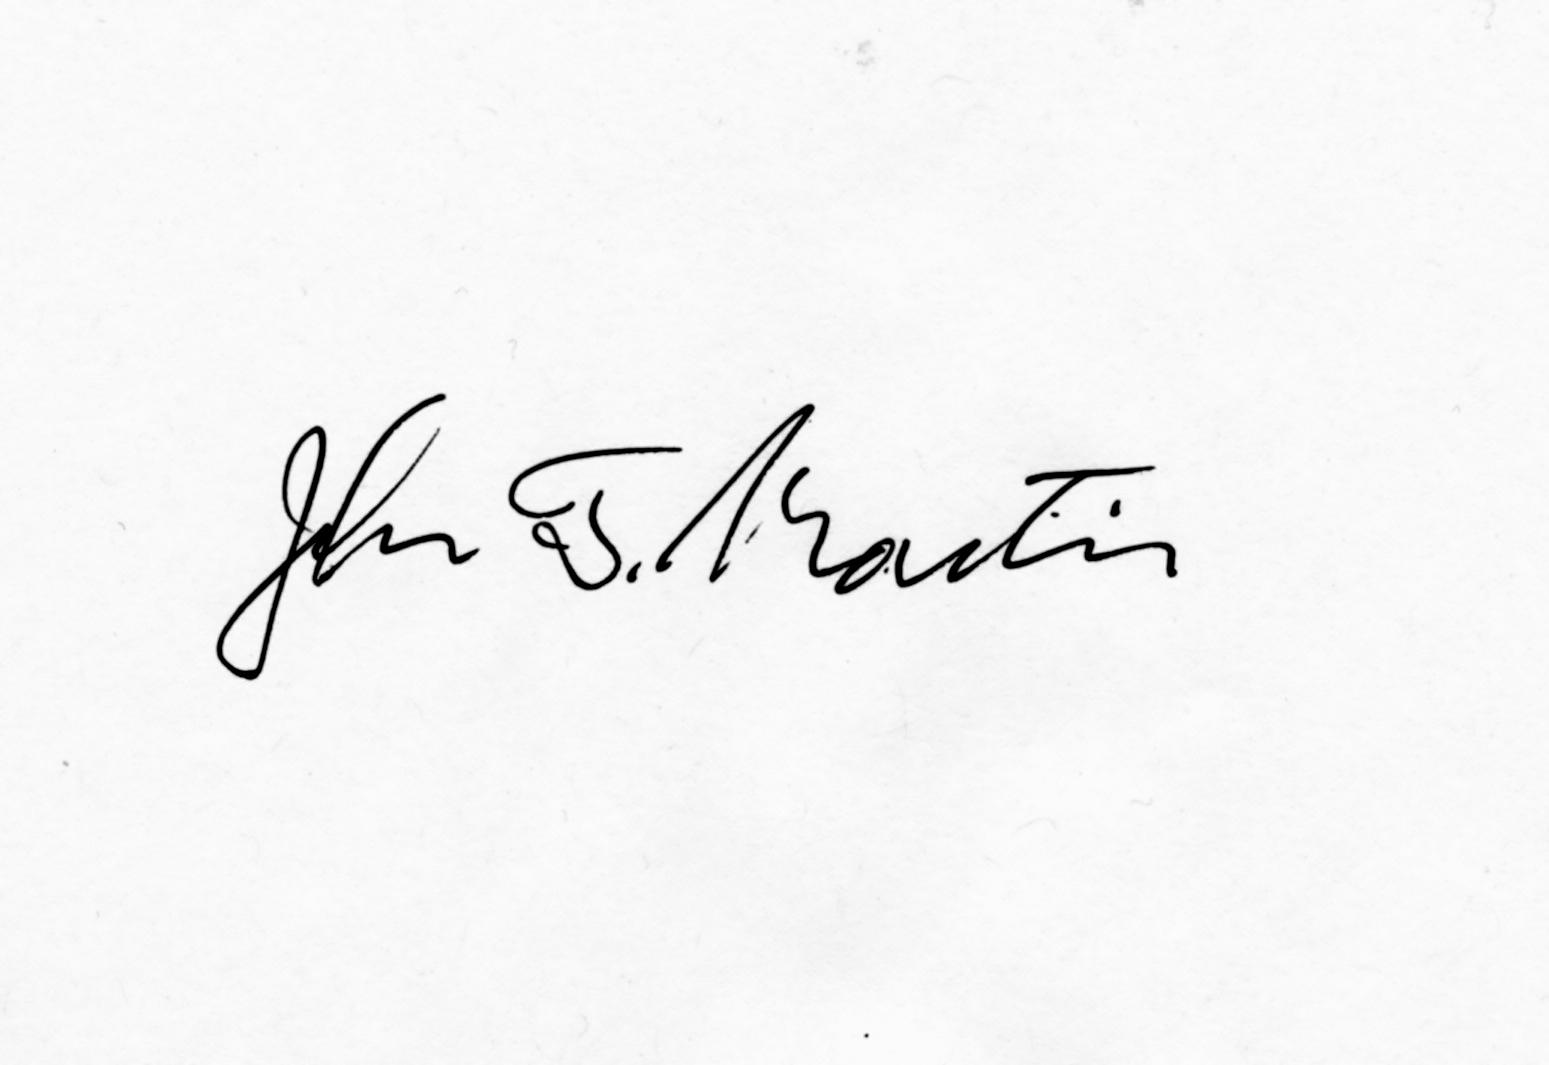 John Martin's Signature